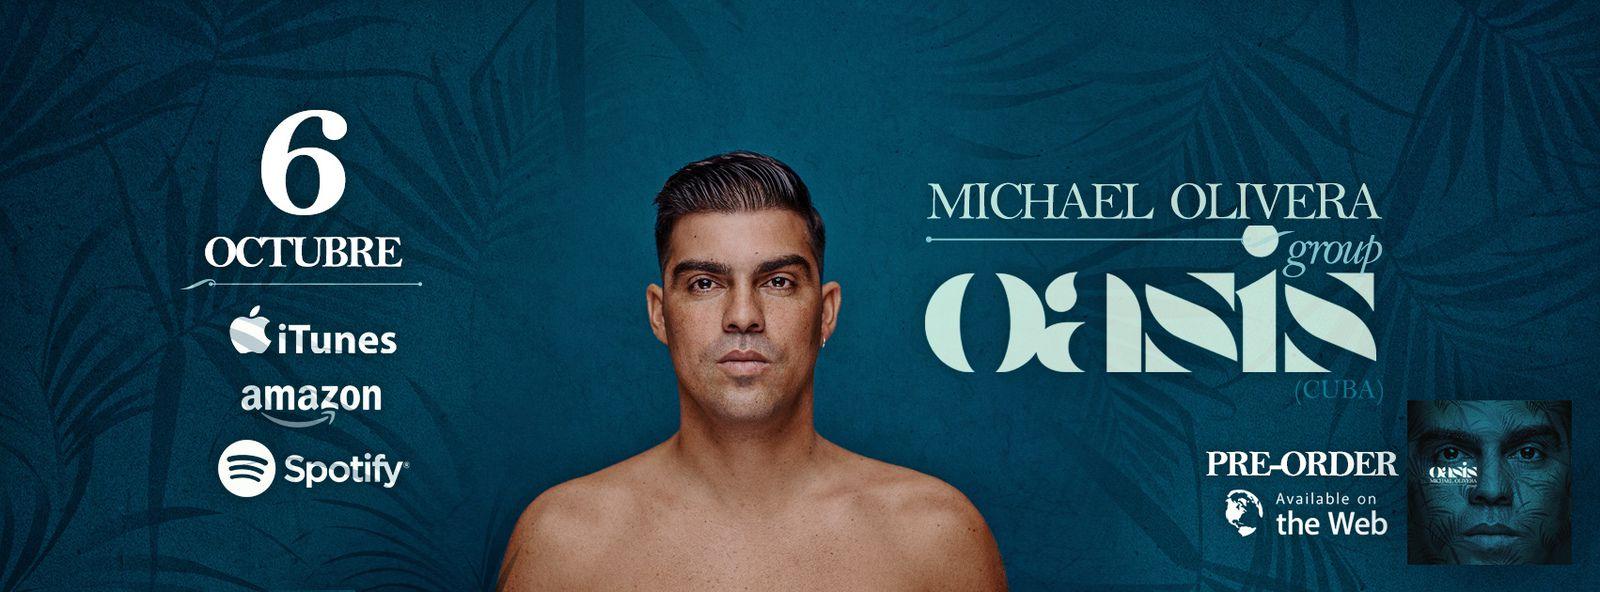 Michael Olivera / OASIS / ashe